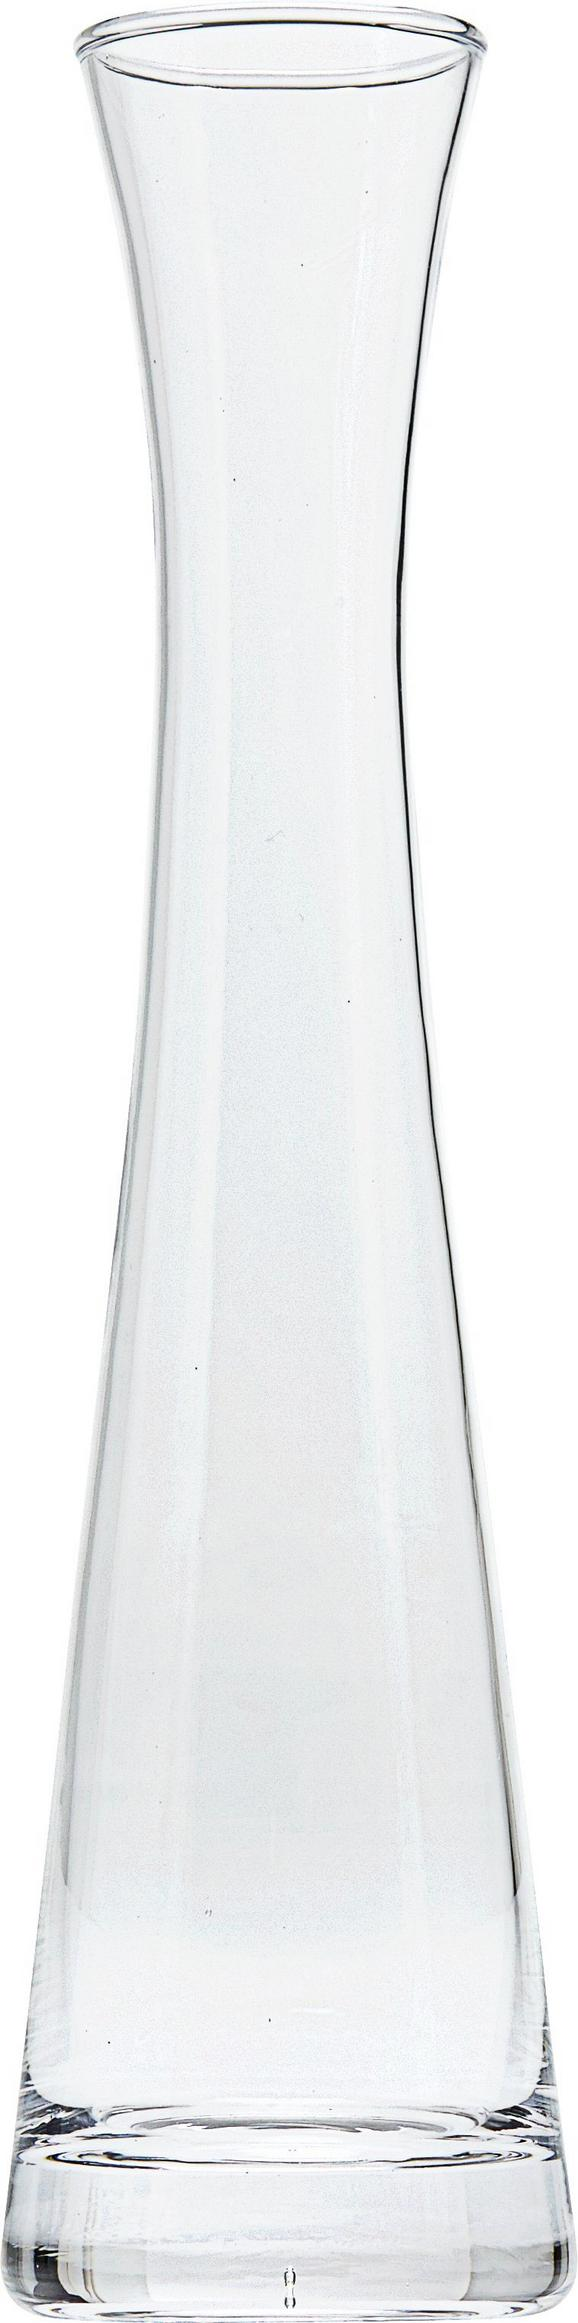 Vase Constanze aus Glas - Klar, Glas (28cm) - Mömax modern living